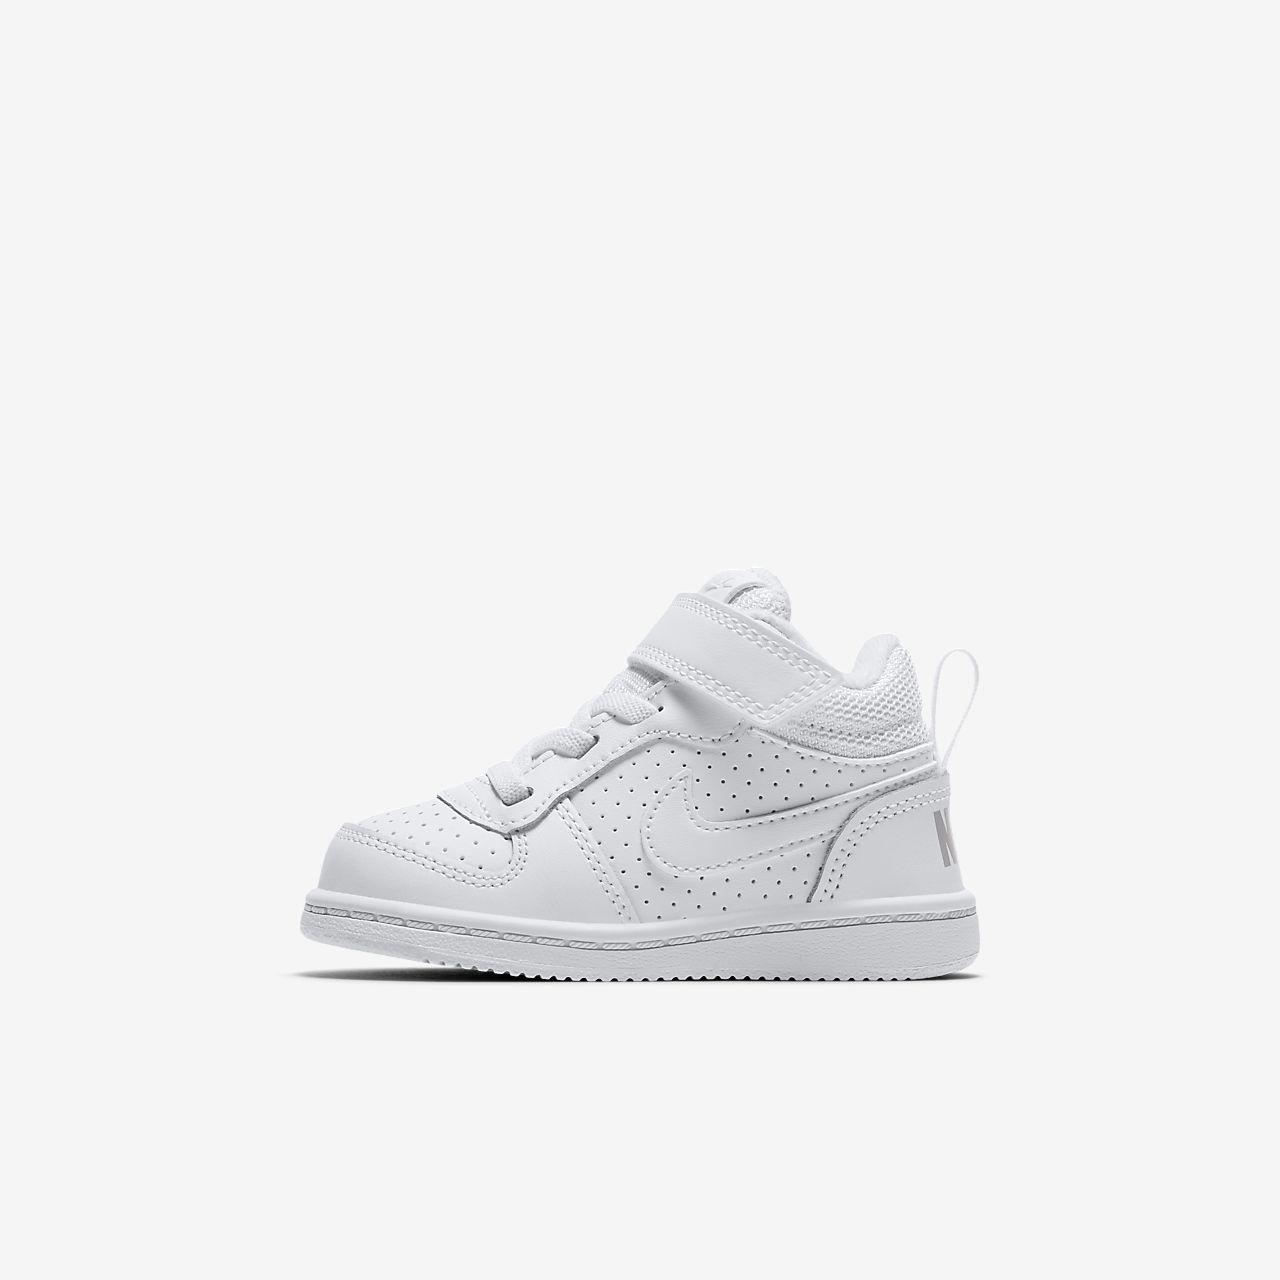 0249da3f152 Παπούτσι NikeCourt Borough Mid για βρέφη και νήπια. Nike.com GR